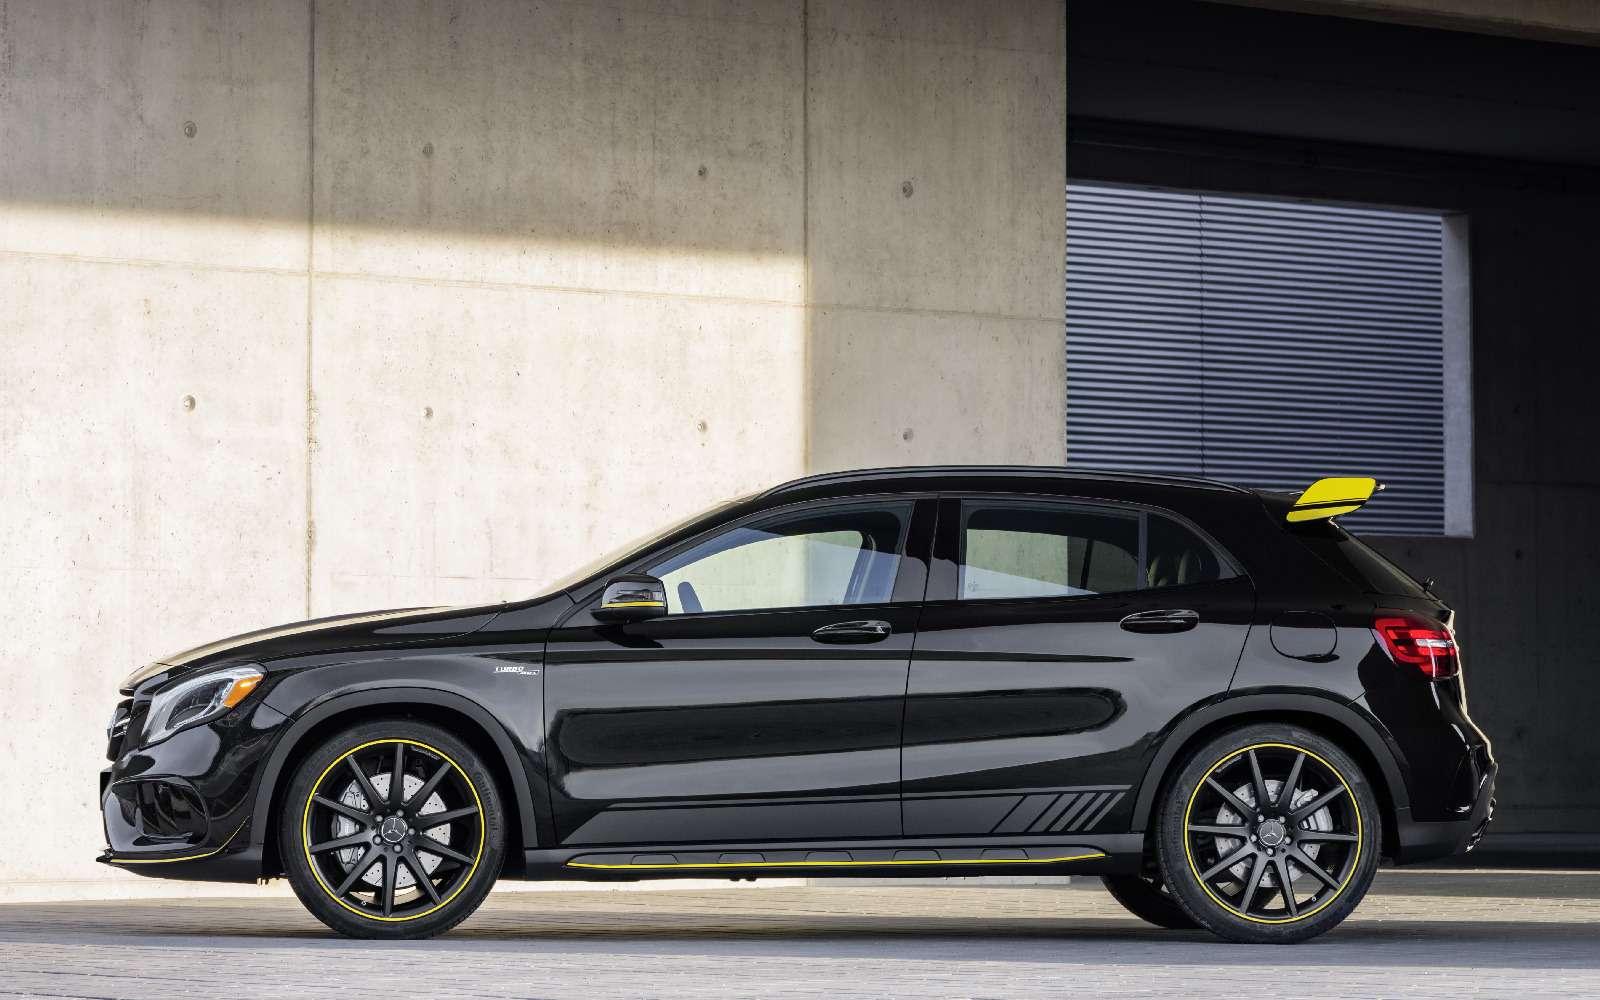 Mercedes-Benz GLA стал краше, ноне просторнее— фото 690078